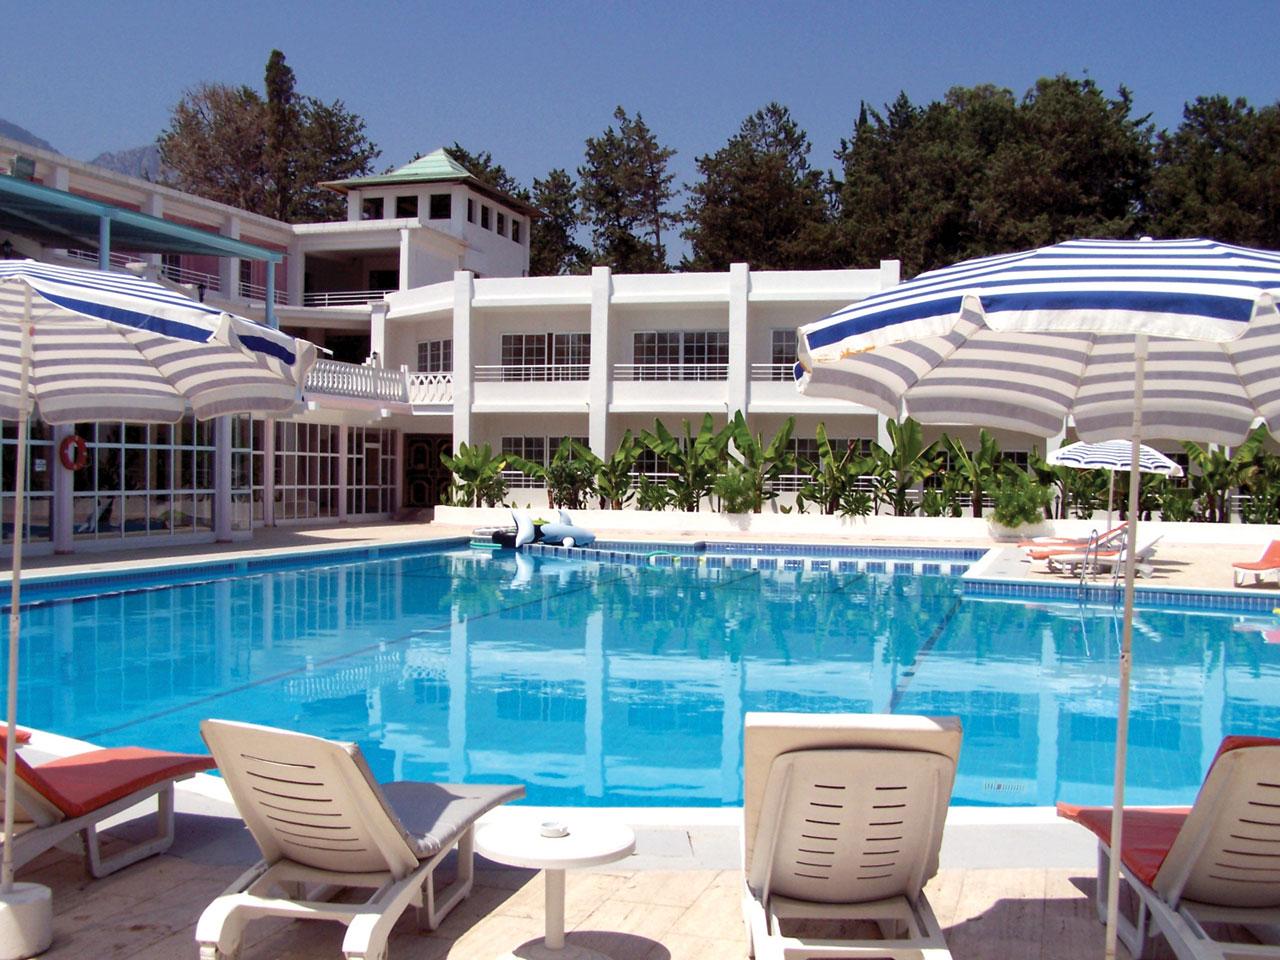 http://www.budavartours.hu/binaries//content/gallery/budavar/locations/accomodations/Ciprus/Kyrenia/L.A.+Beach+Resort/hotel_20130930220049.jpg